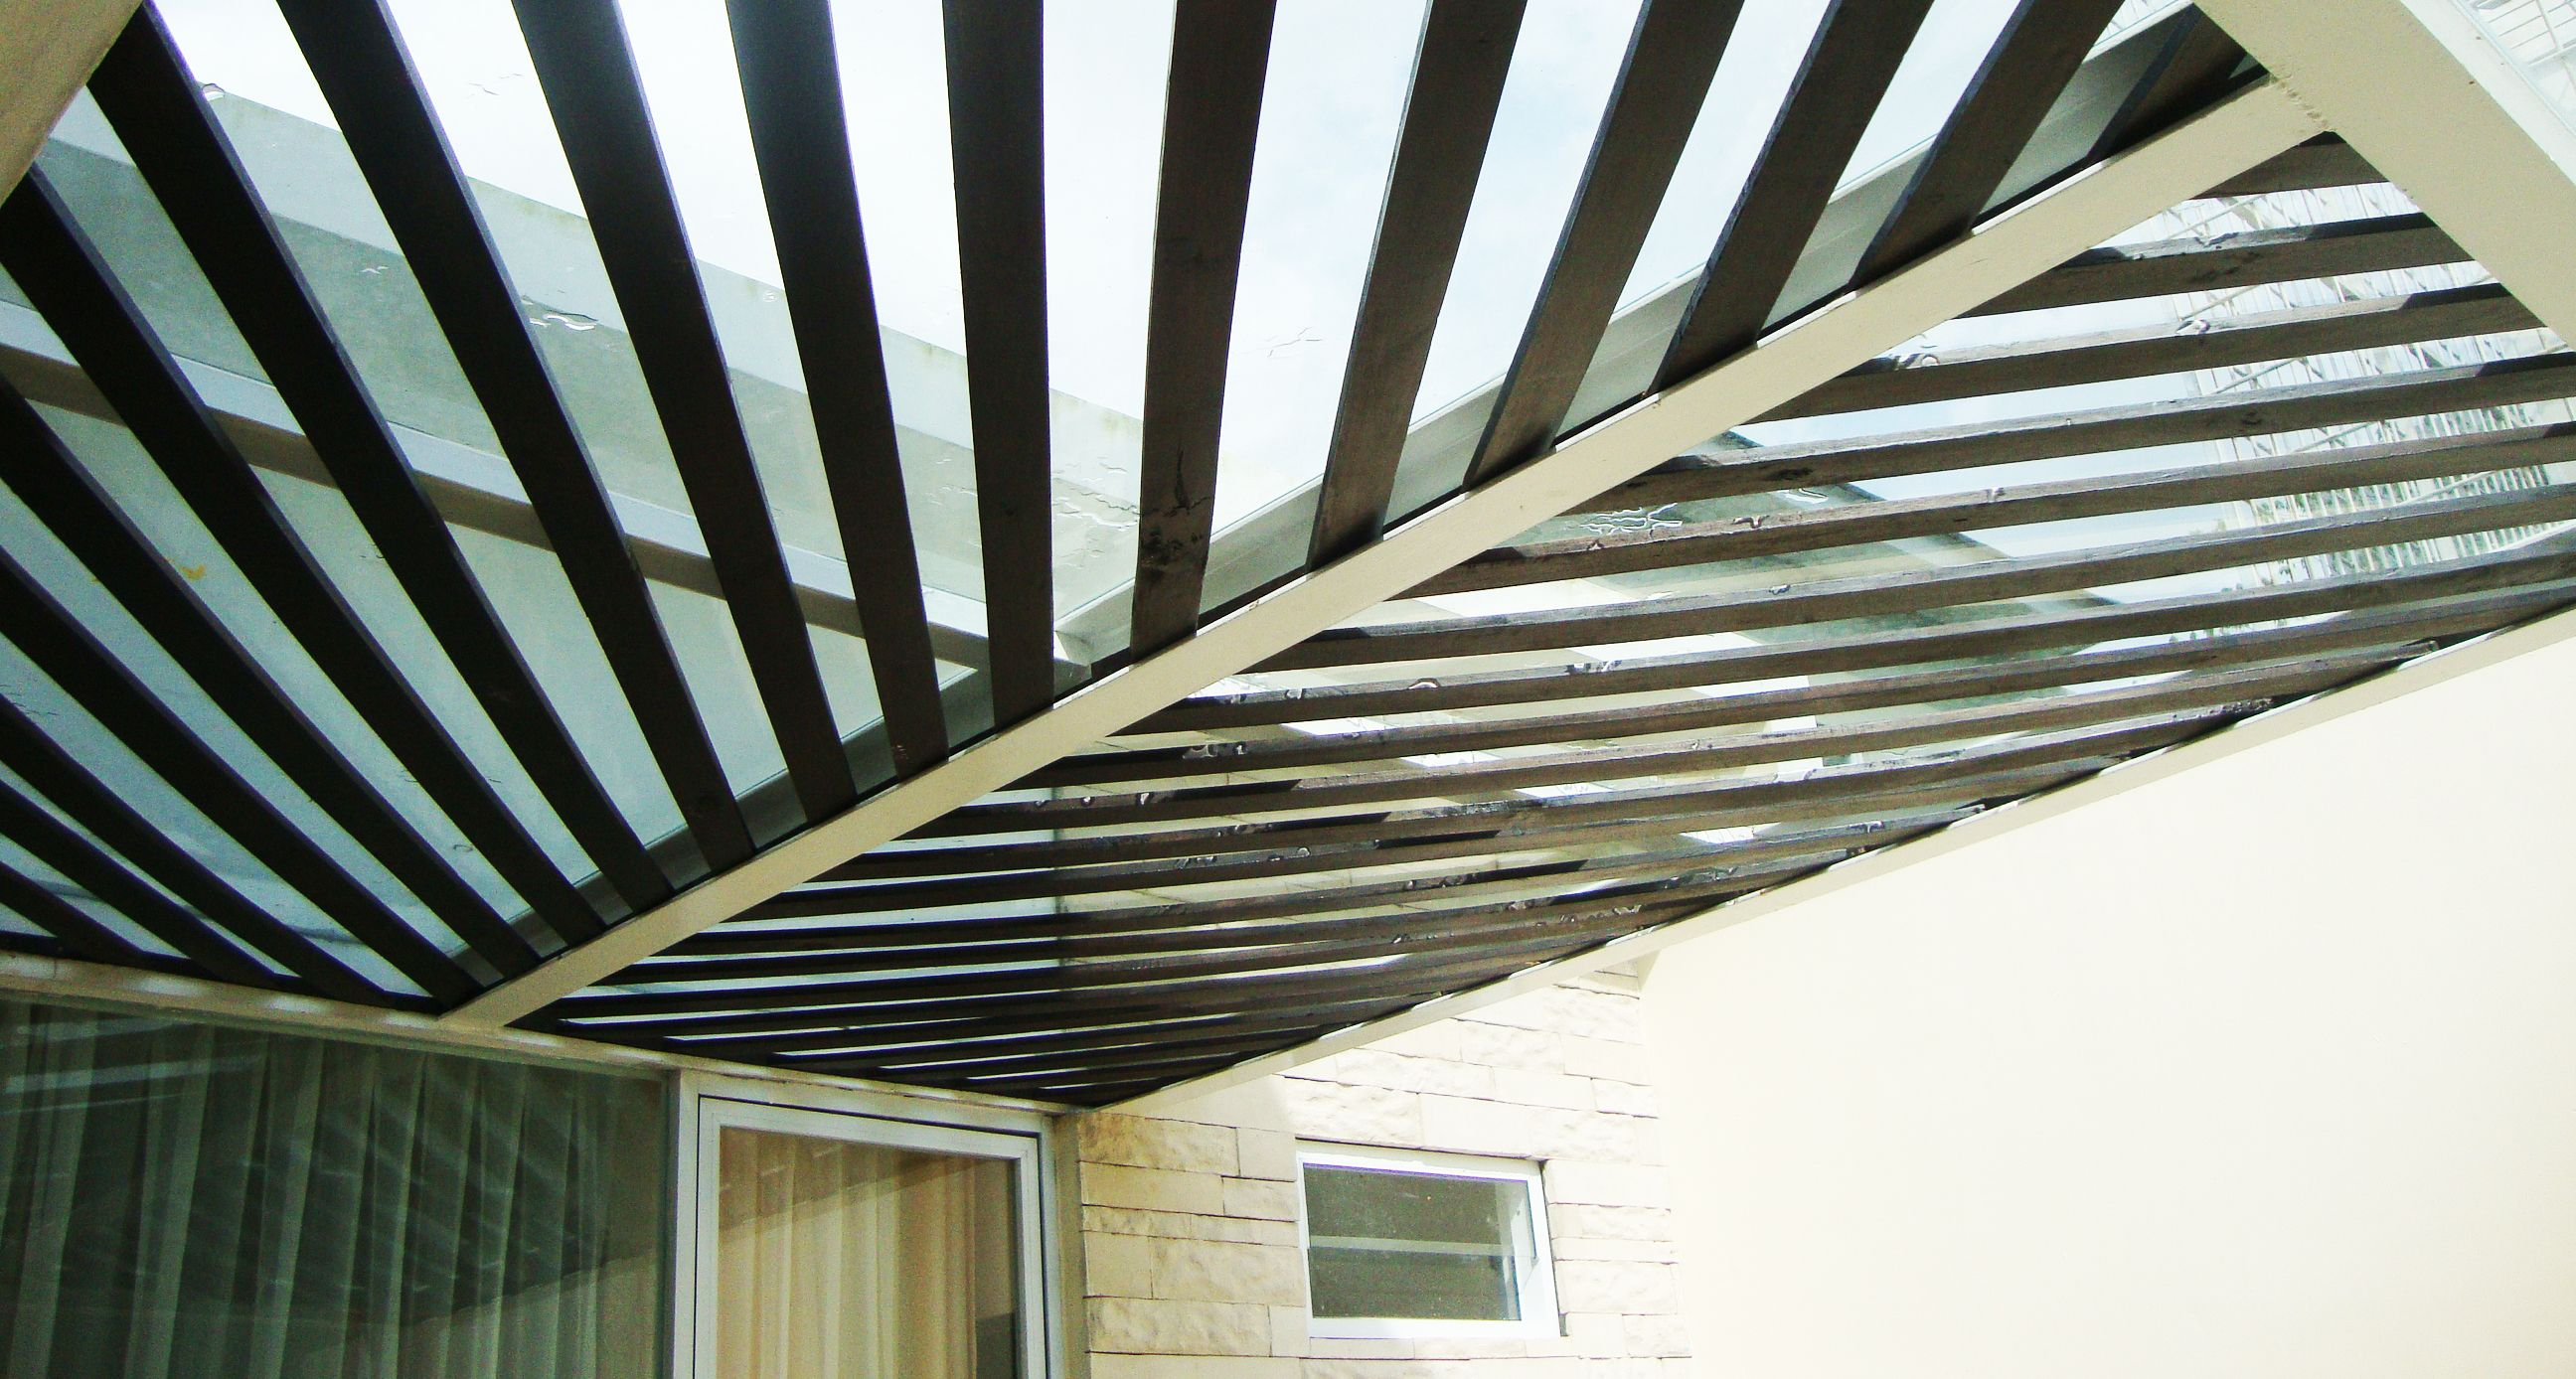 Canopy Glass pada halaman belakang rumah dikombinasi dengan Kayu